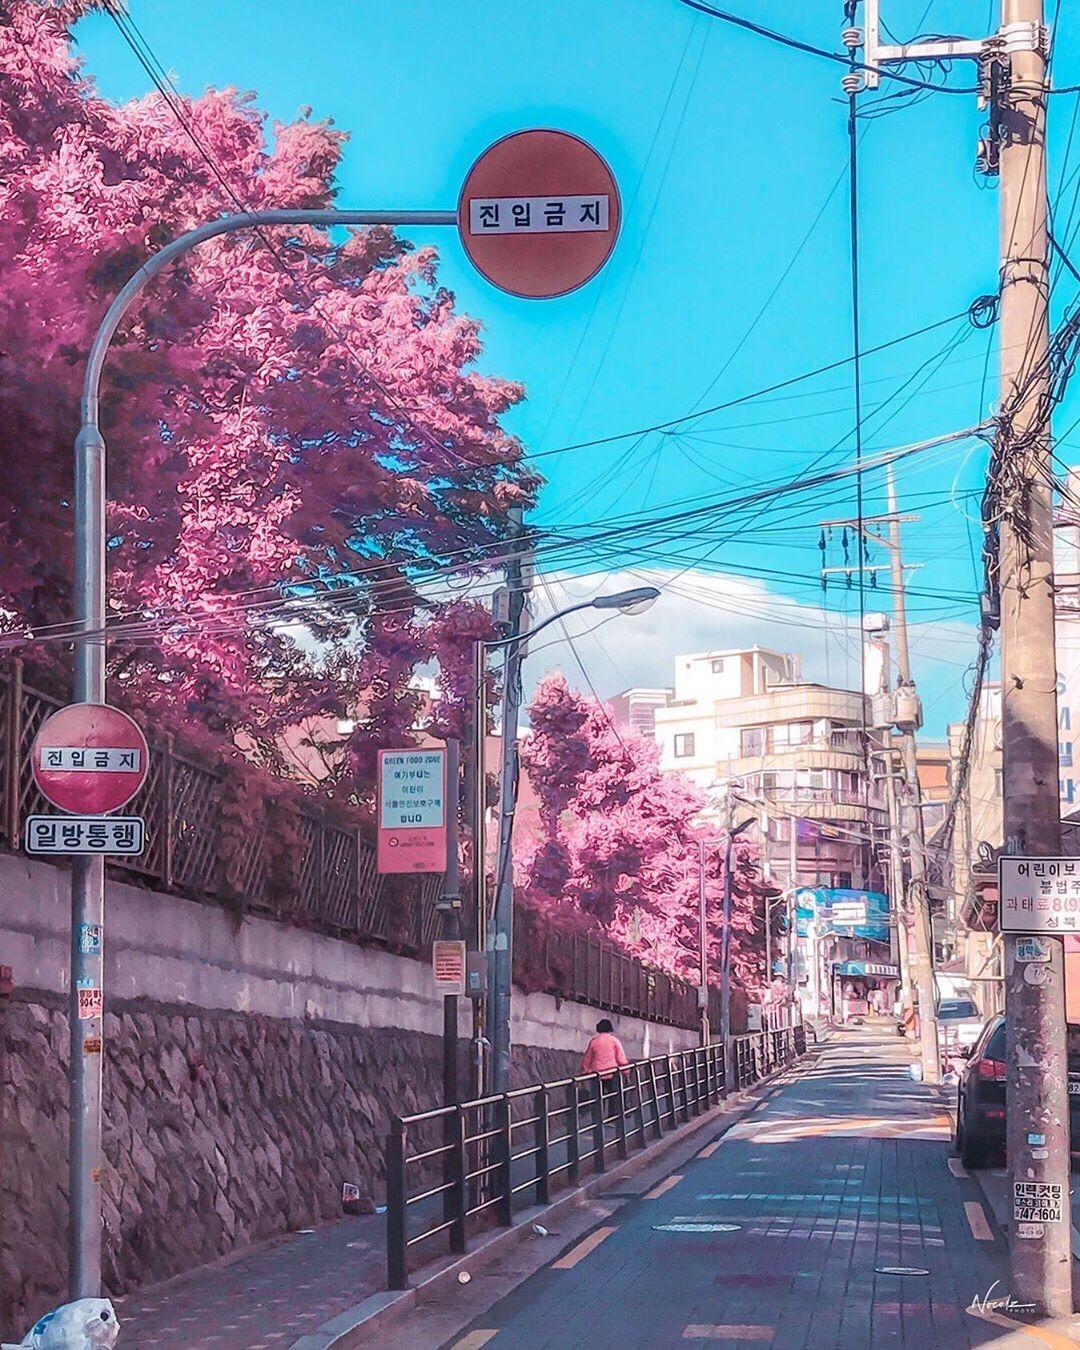 Aesthetic pinks around Seoul, South Korea taken during the